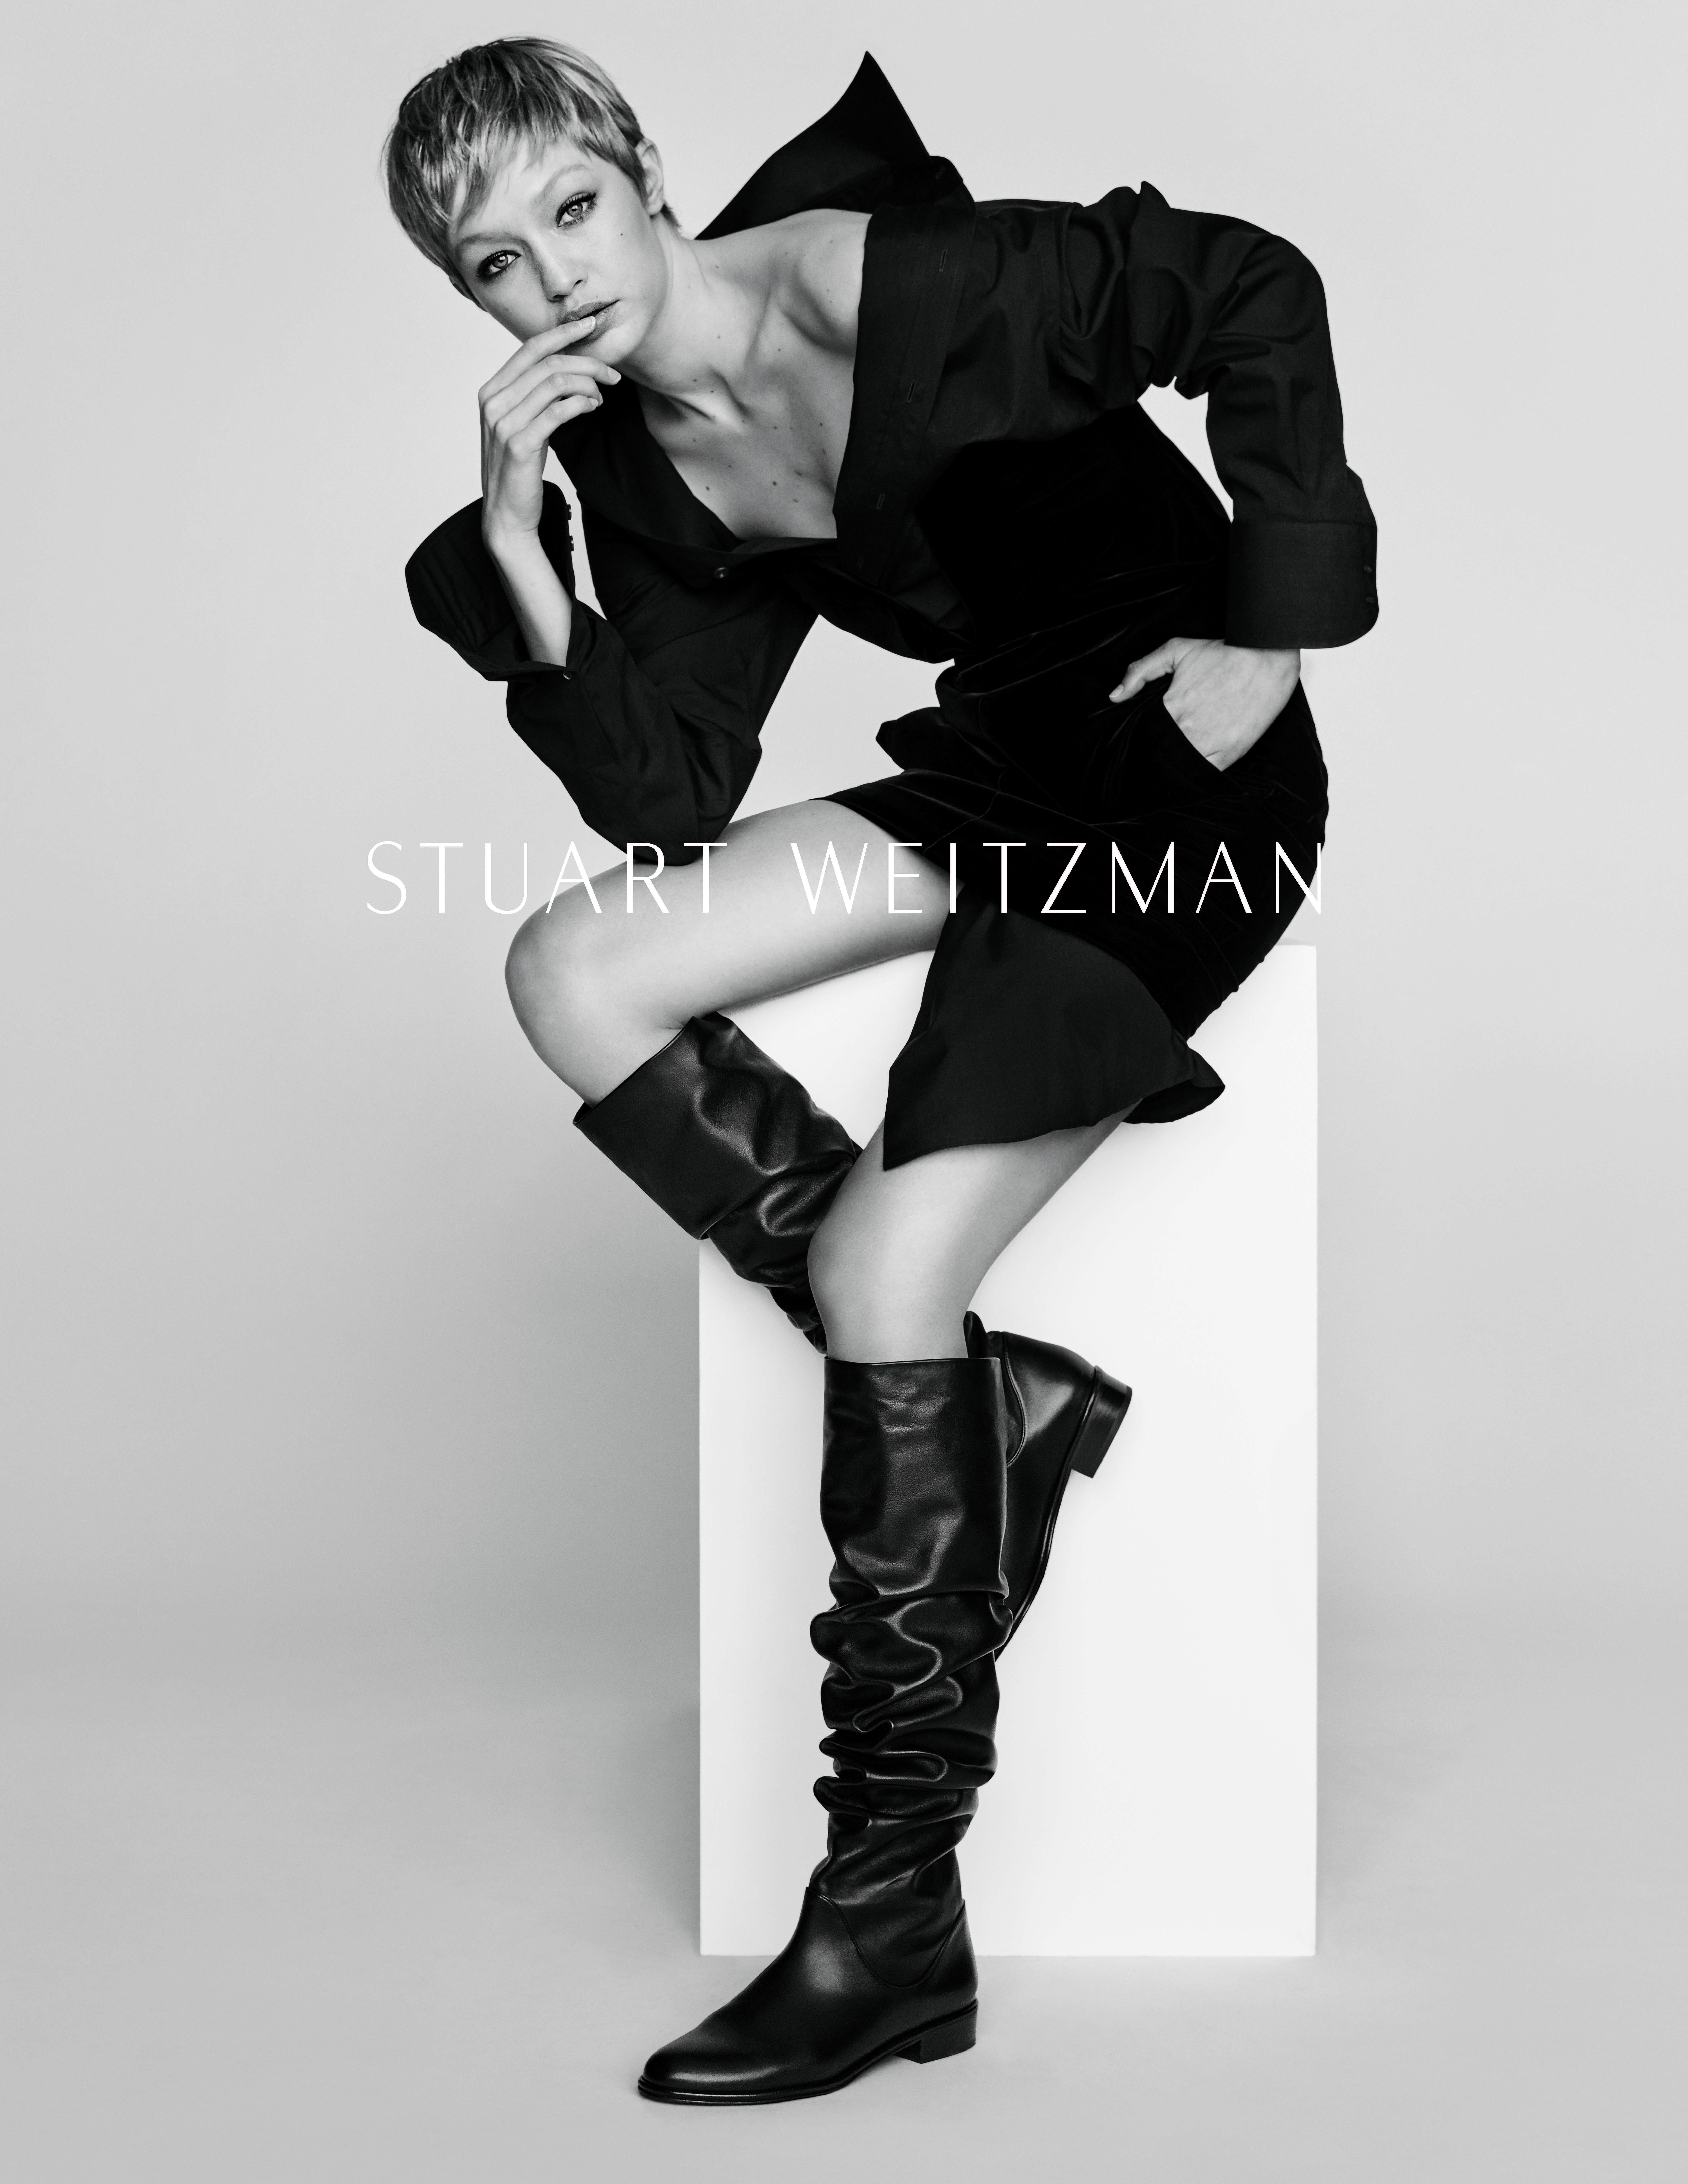 e44099ed4e5 The FW17 Stuart Weitzman Campaign featuring Gigi Hadid in the Flatscrunchy  Boot